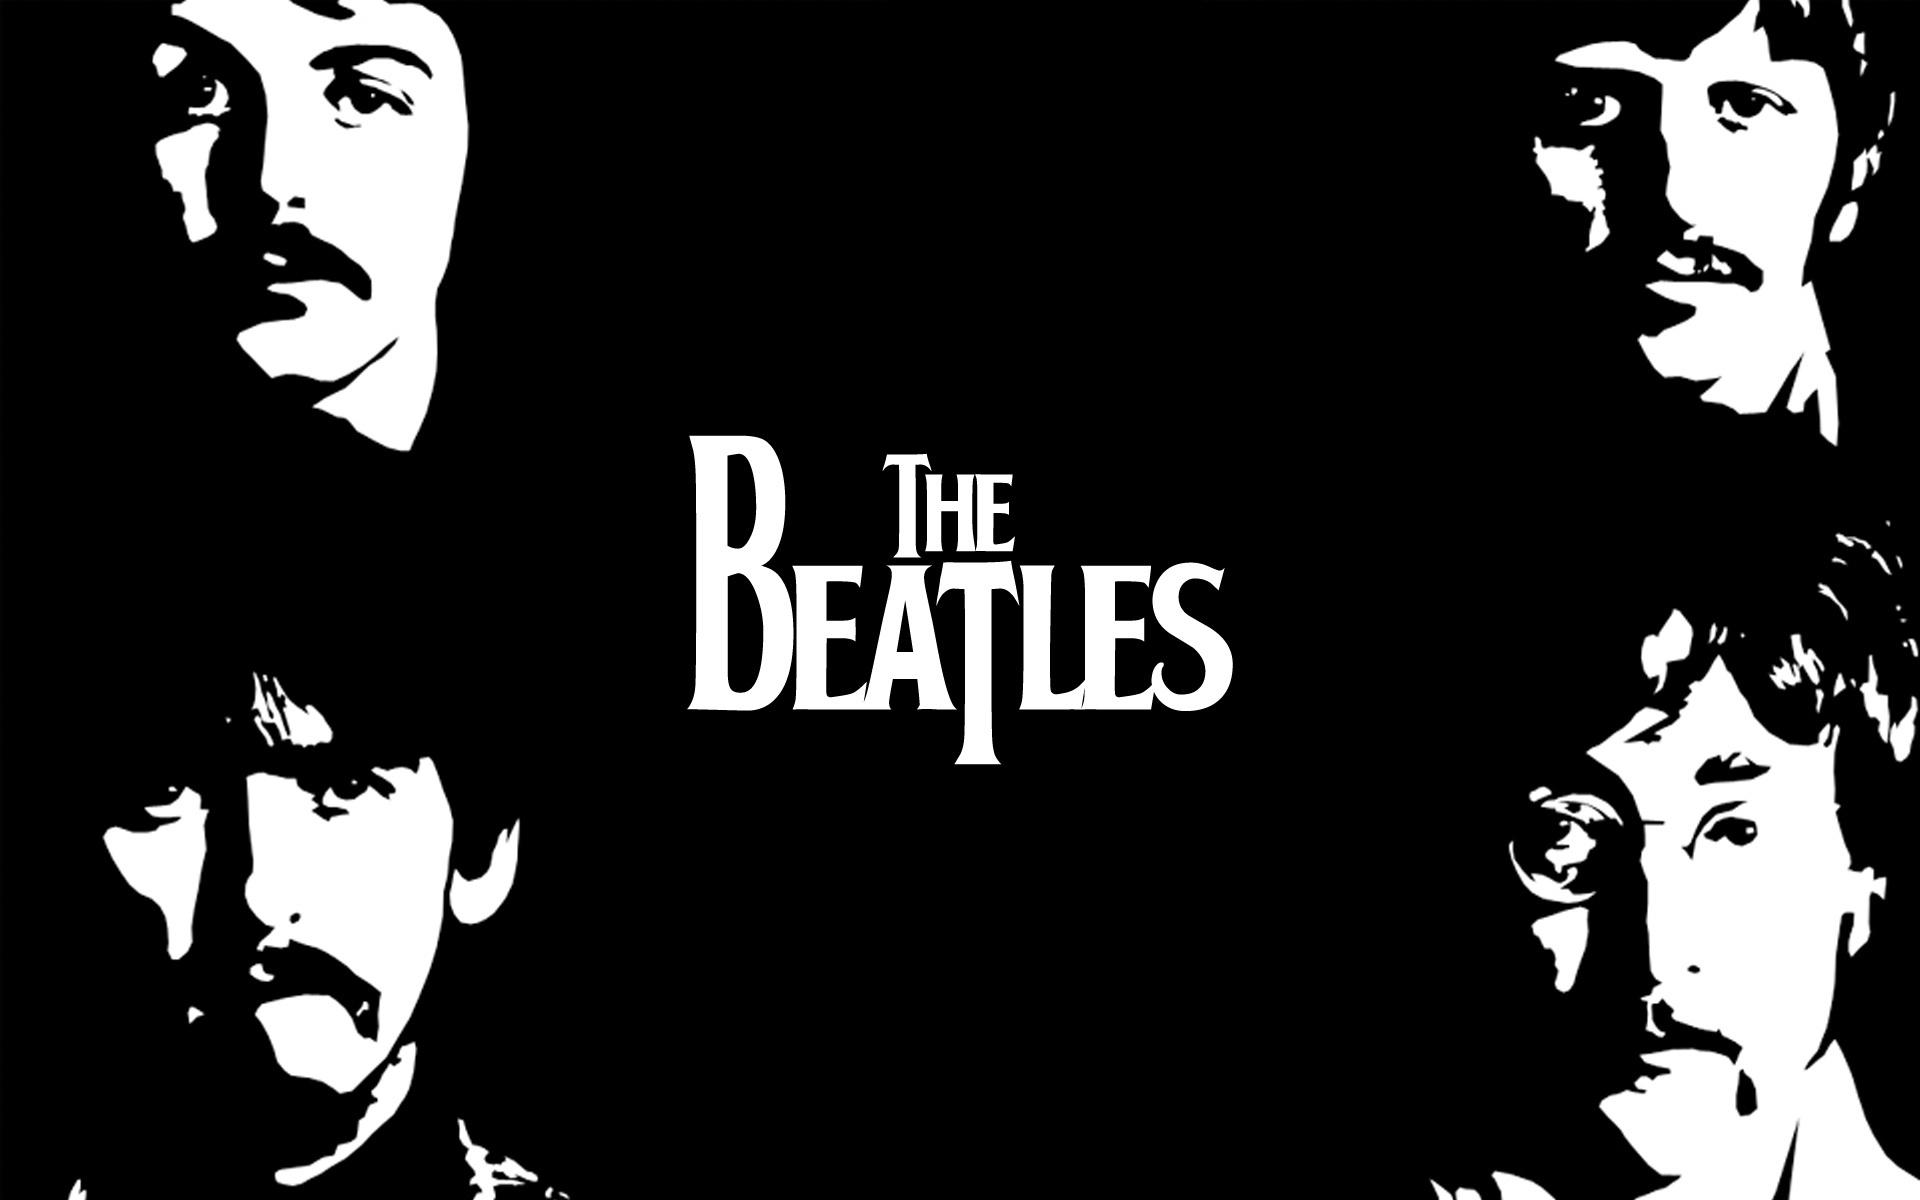 The Beatles Music